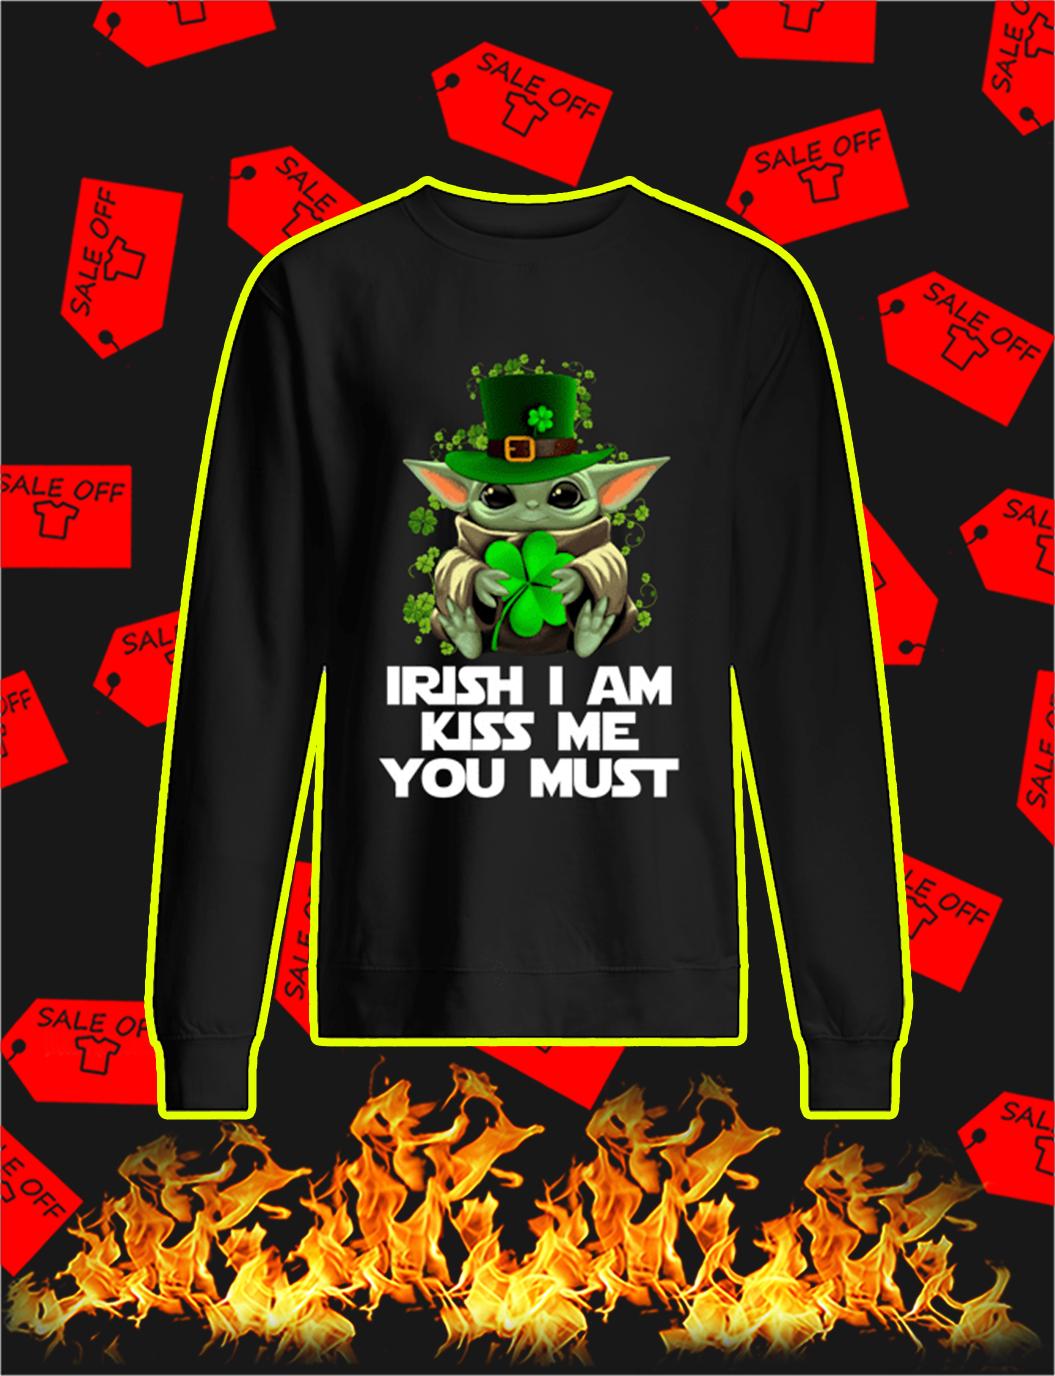 Baby Yoda Irish I Am Kiss Me You Must sweatshirtBaby Yoda Irish I Am Kiss Me You Must sweatshirt